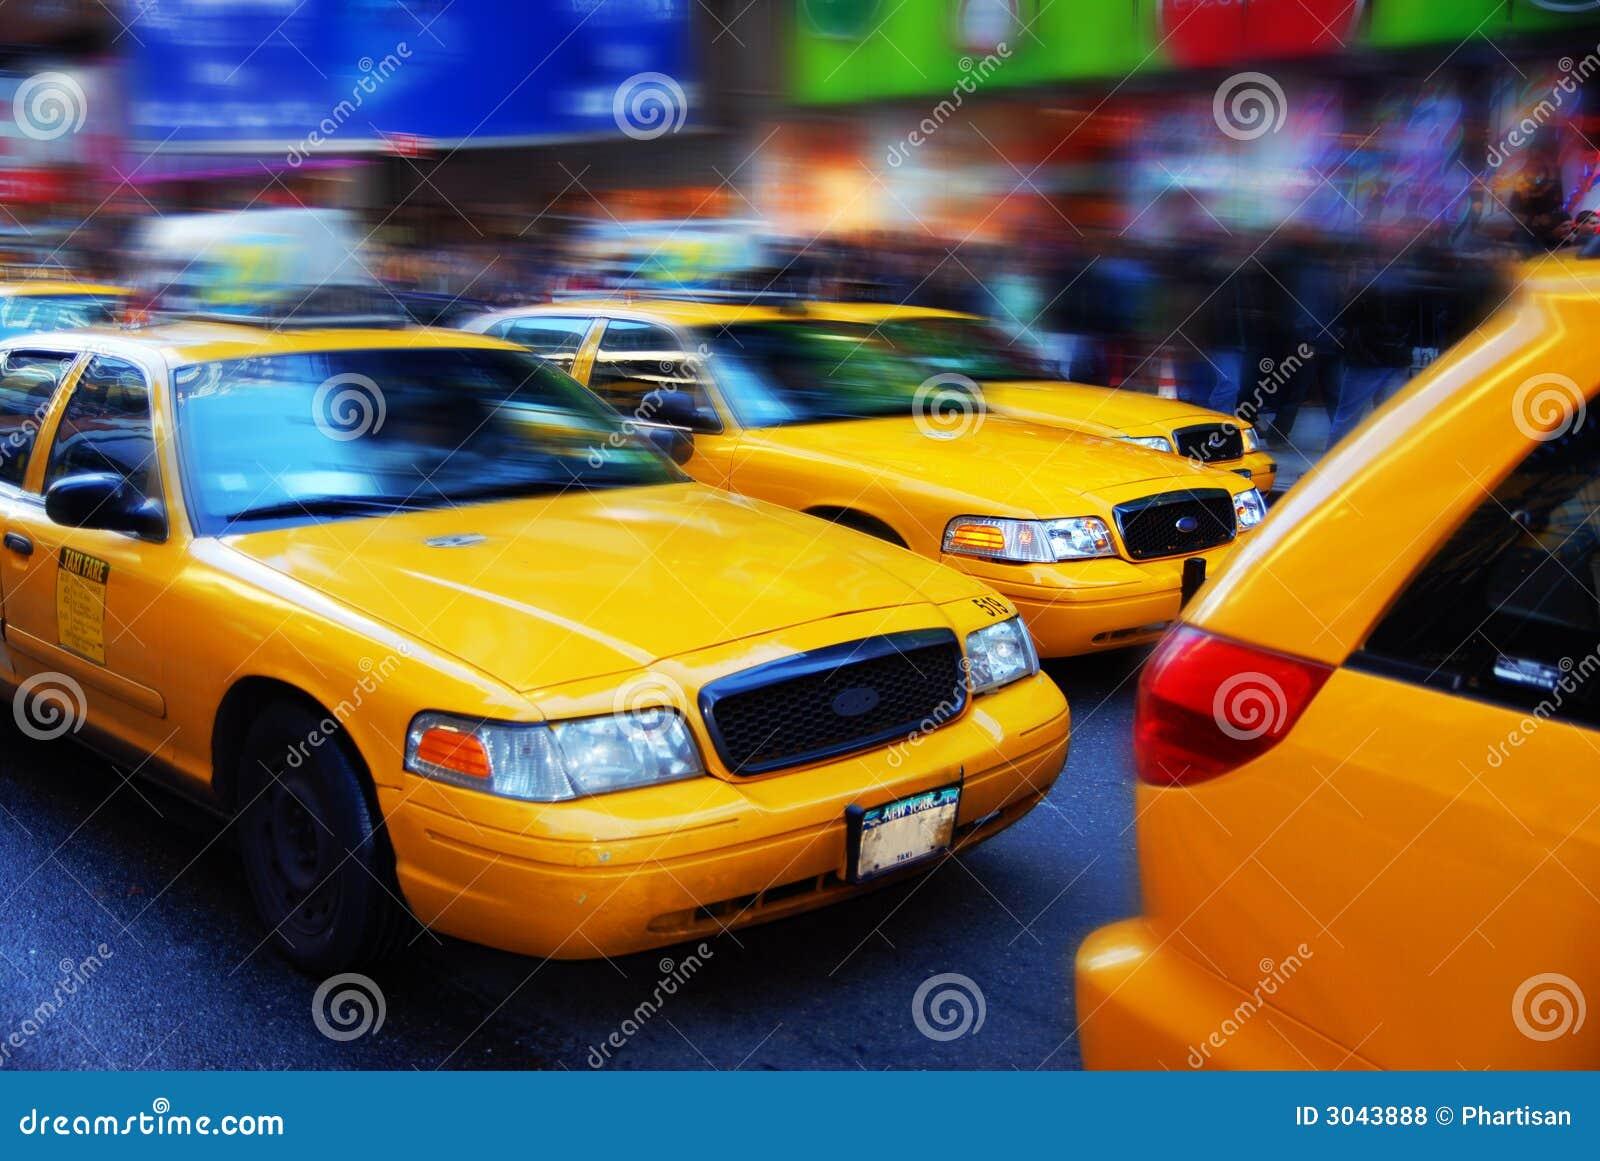 Carrozze gialle nei periodi quadrati, NYC